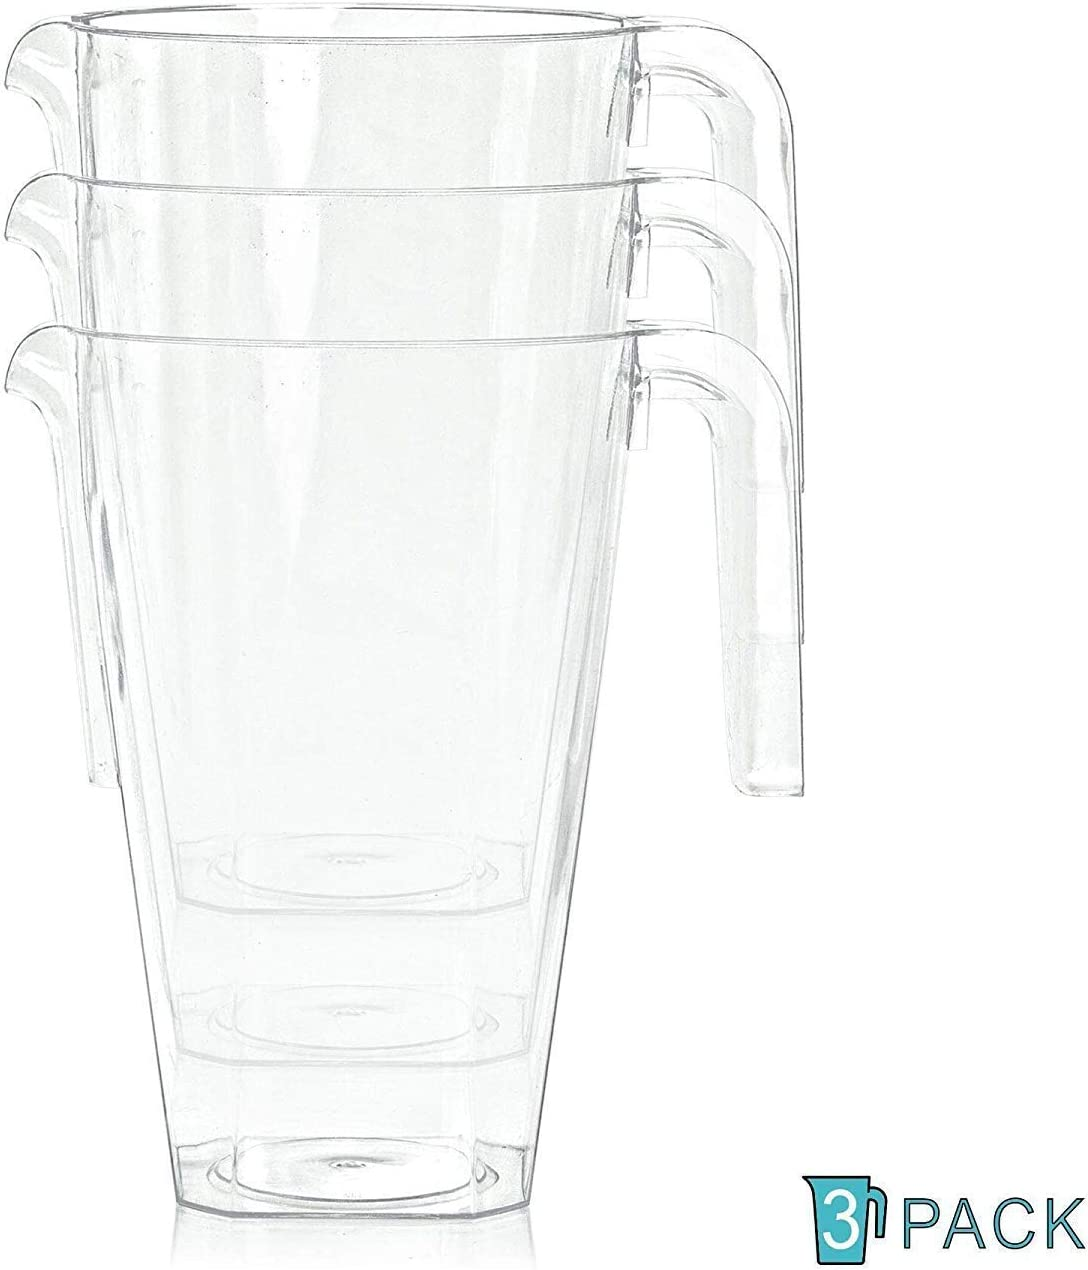 1200 ml transparent 3 St/ück 1,2 L langlebig Kunststoff-Krug f/ür Partys wiederverwendbar